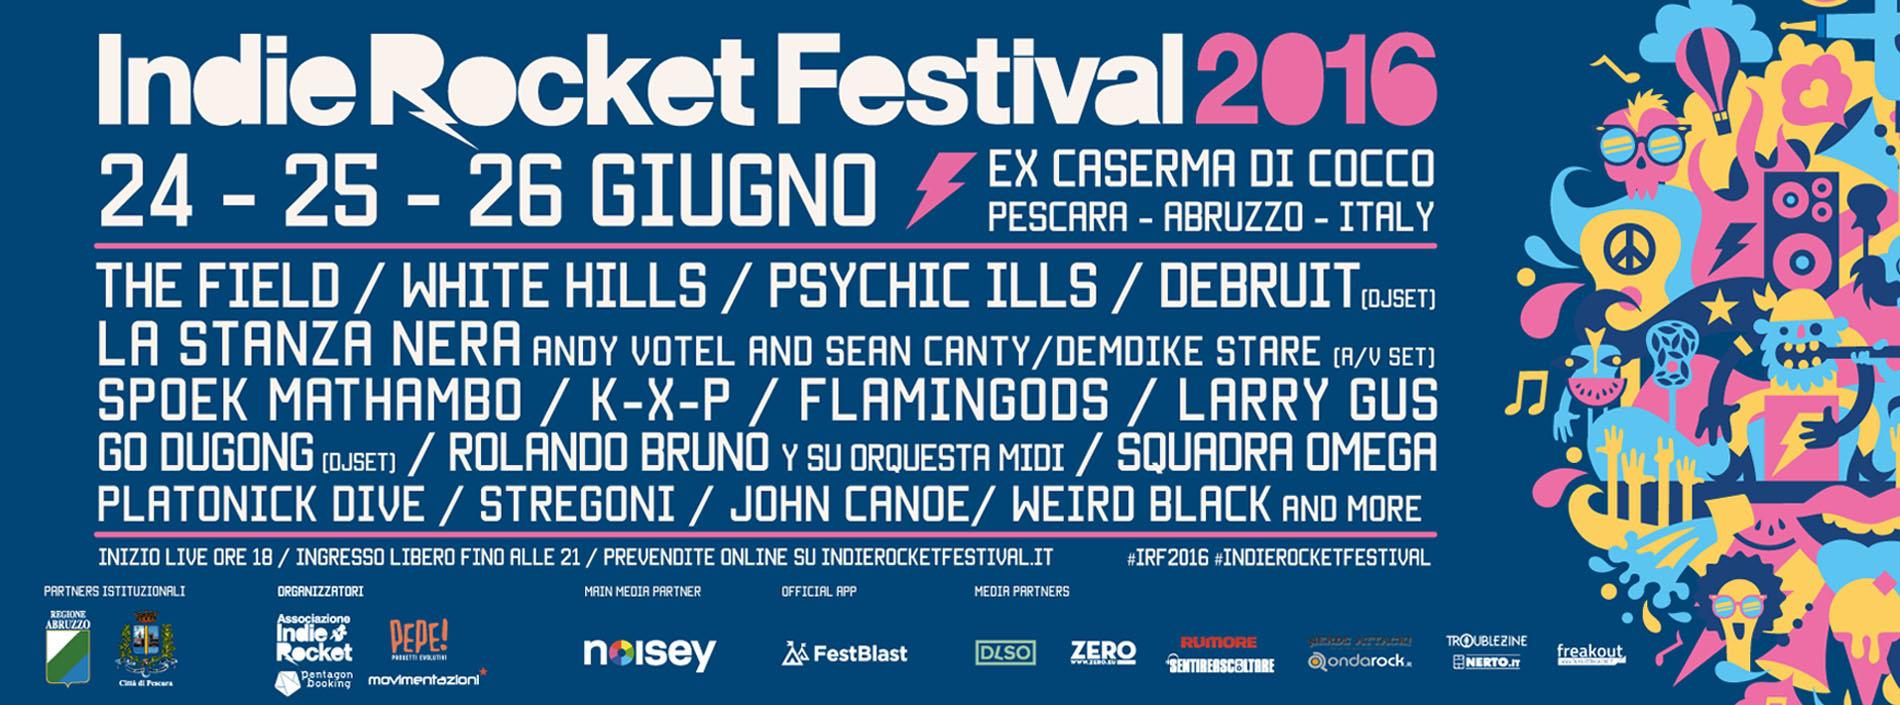 Pescara, da venerdì l'IndieRocket Festival #IRF2016